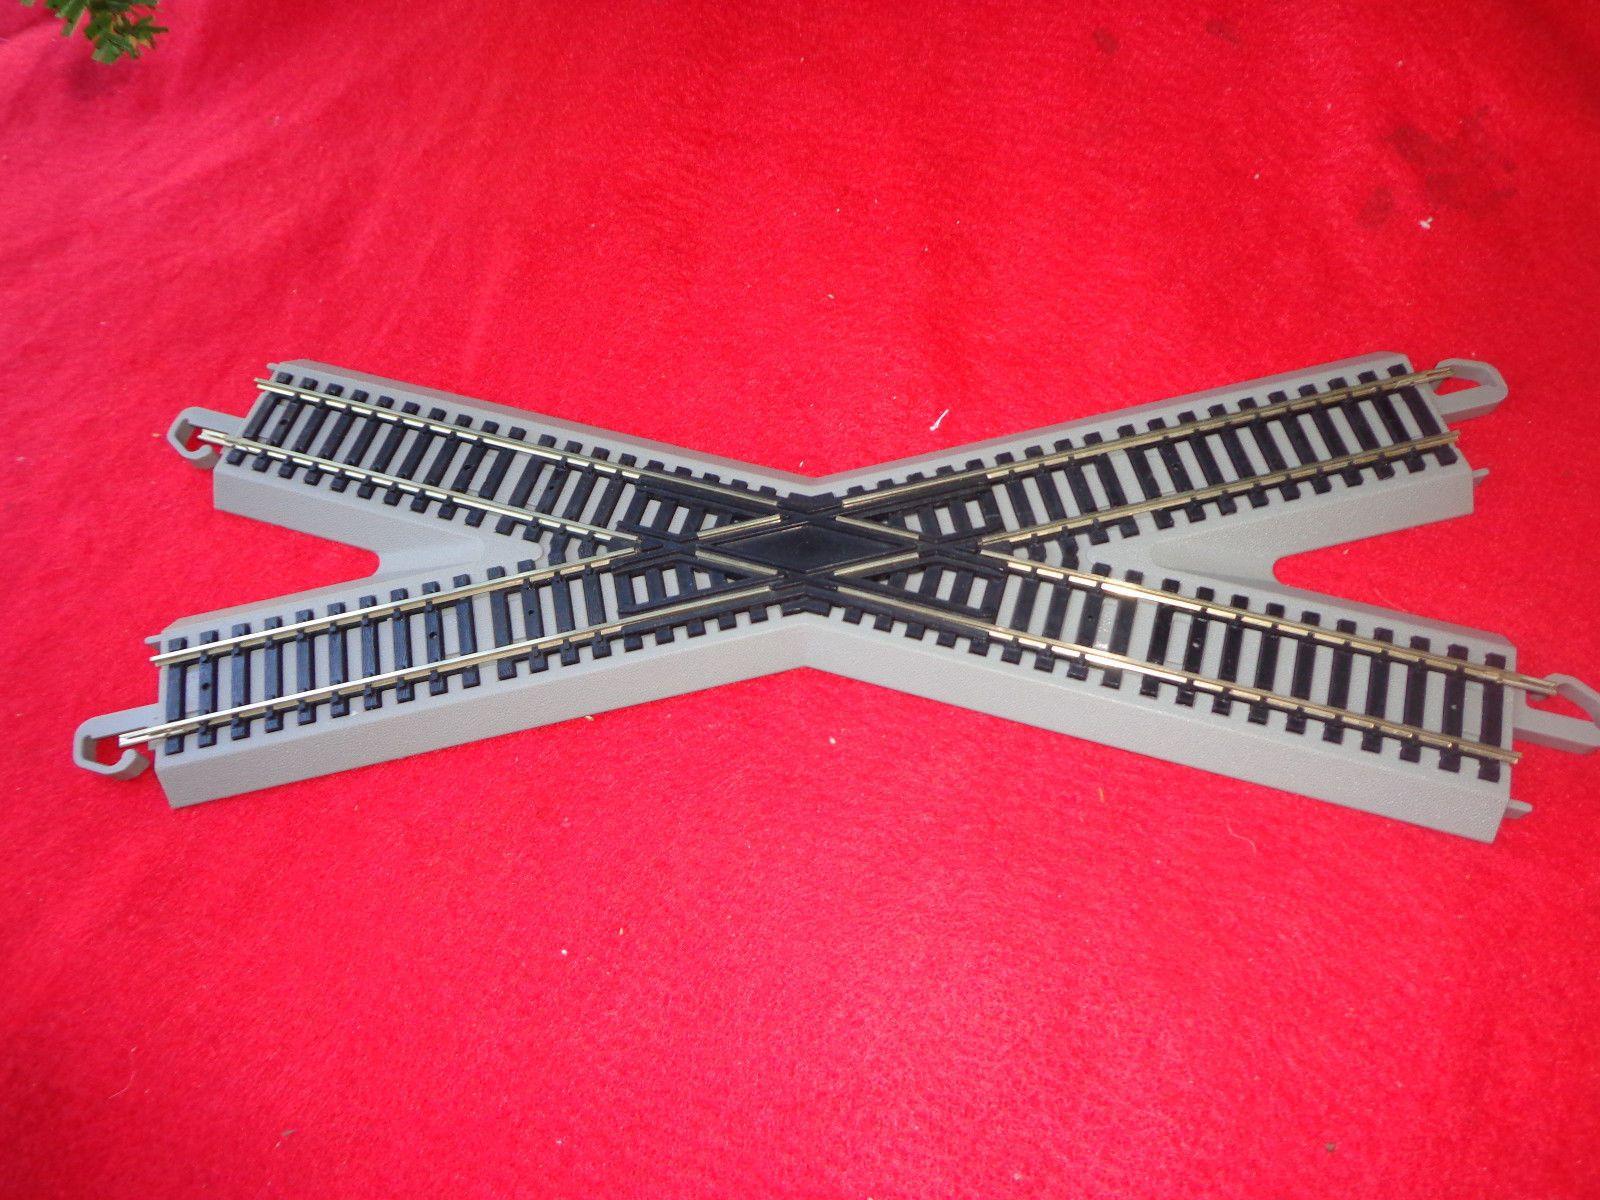 HO SCALE MODEL RAILROAD TRAIN LAYOUT BACHMANN EZ TRACK